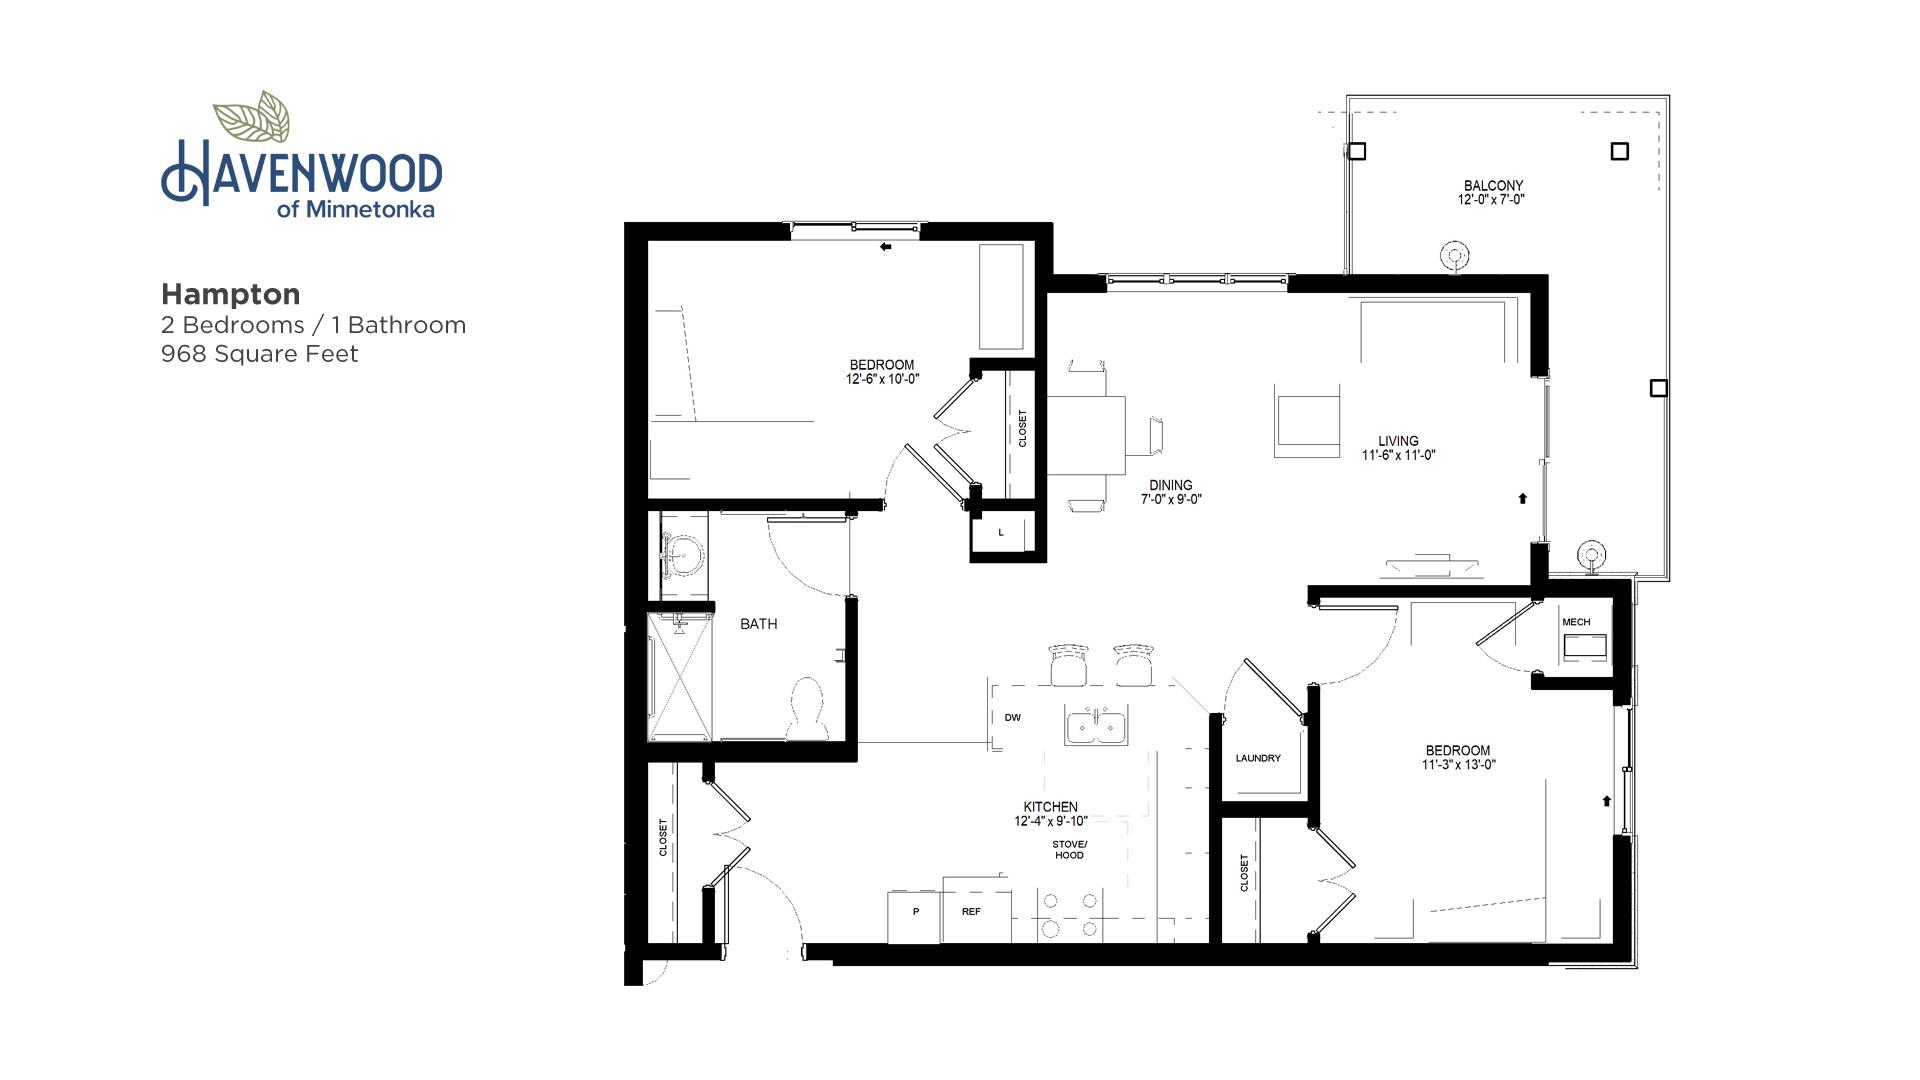 Havenwood of Minnetonka Hampton Floor Plan